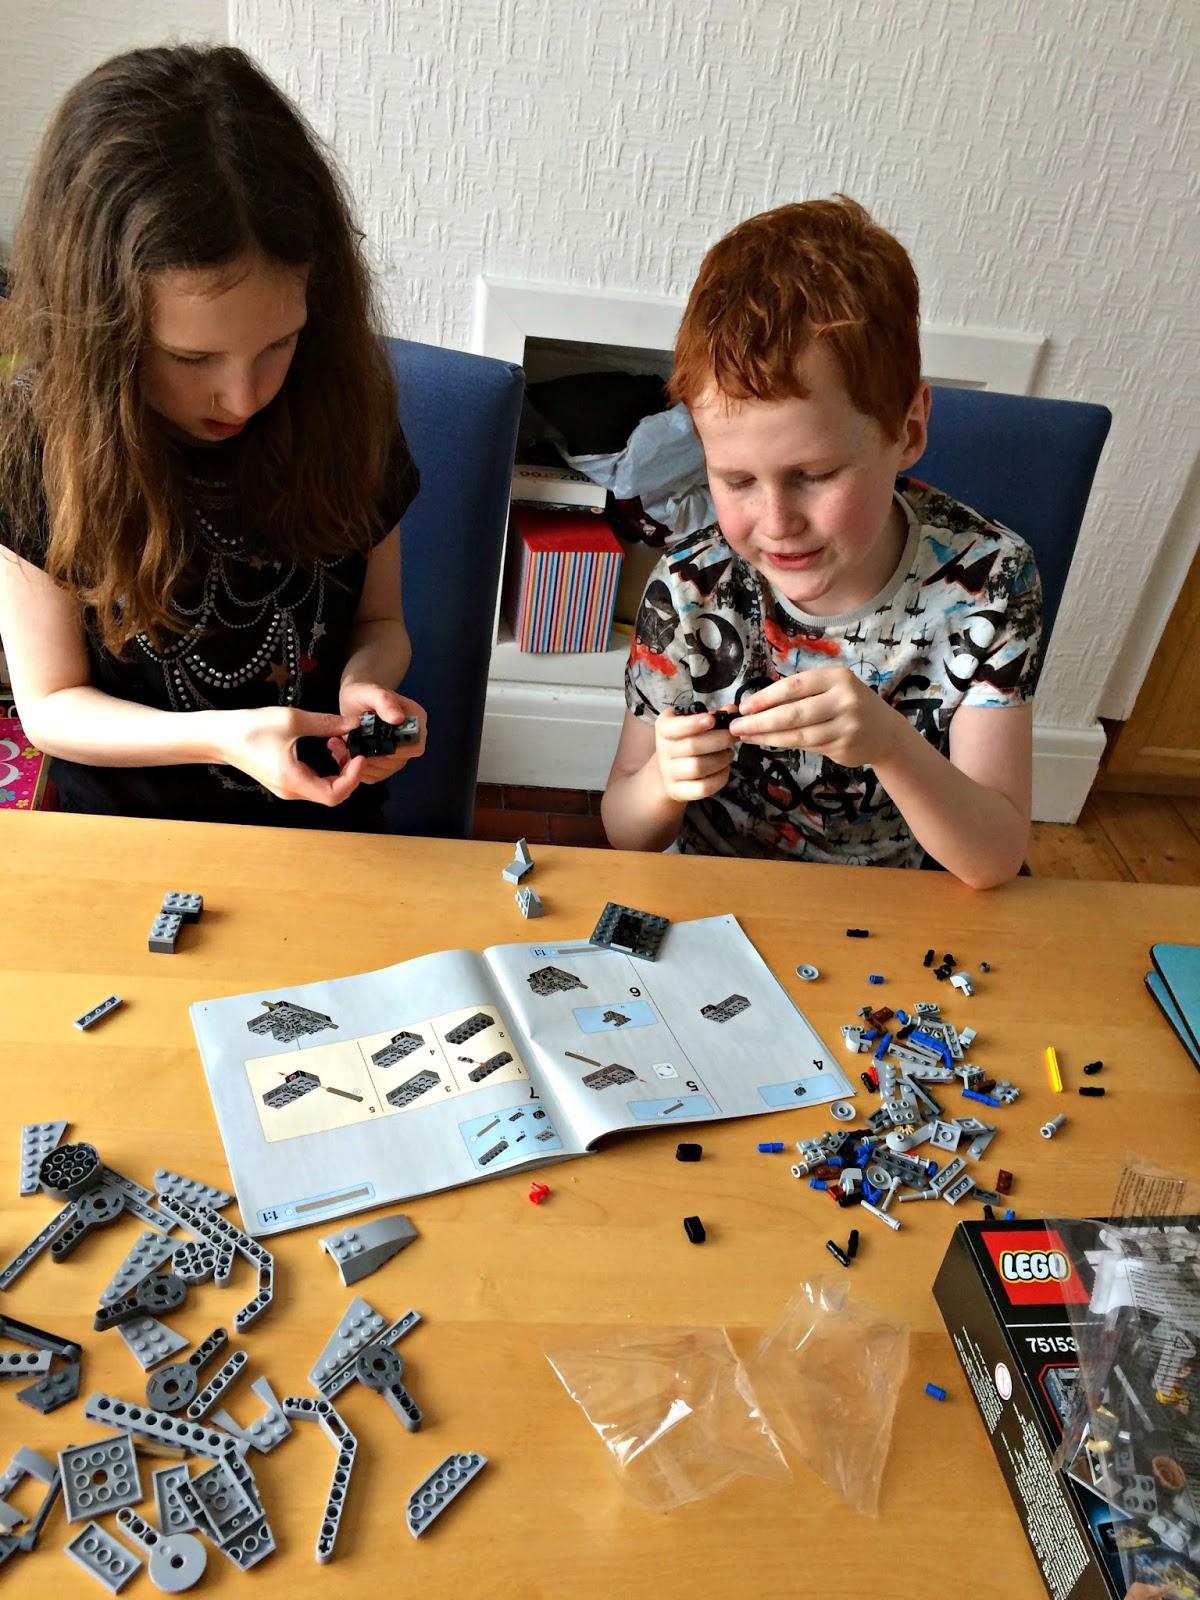 Caitlin & Ieuan assembling the Lego Star Wars R1 AT-ST Walker 75153 Building Set